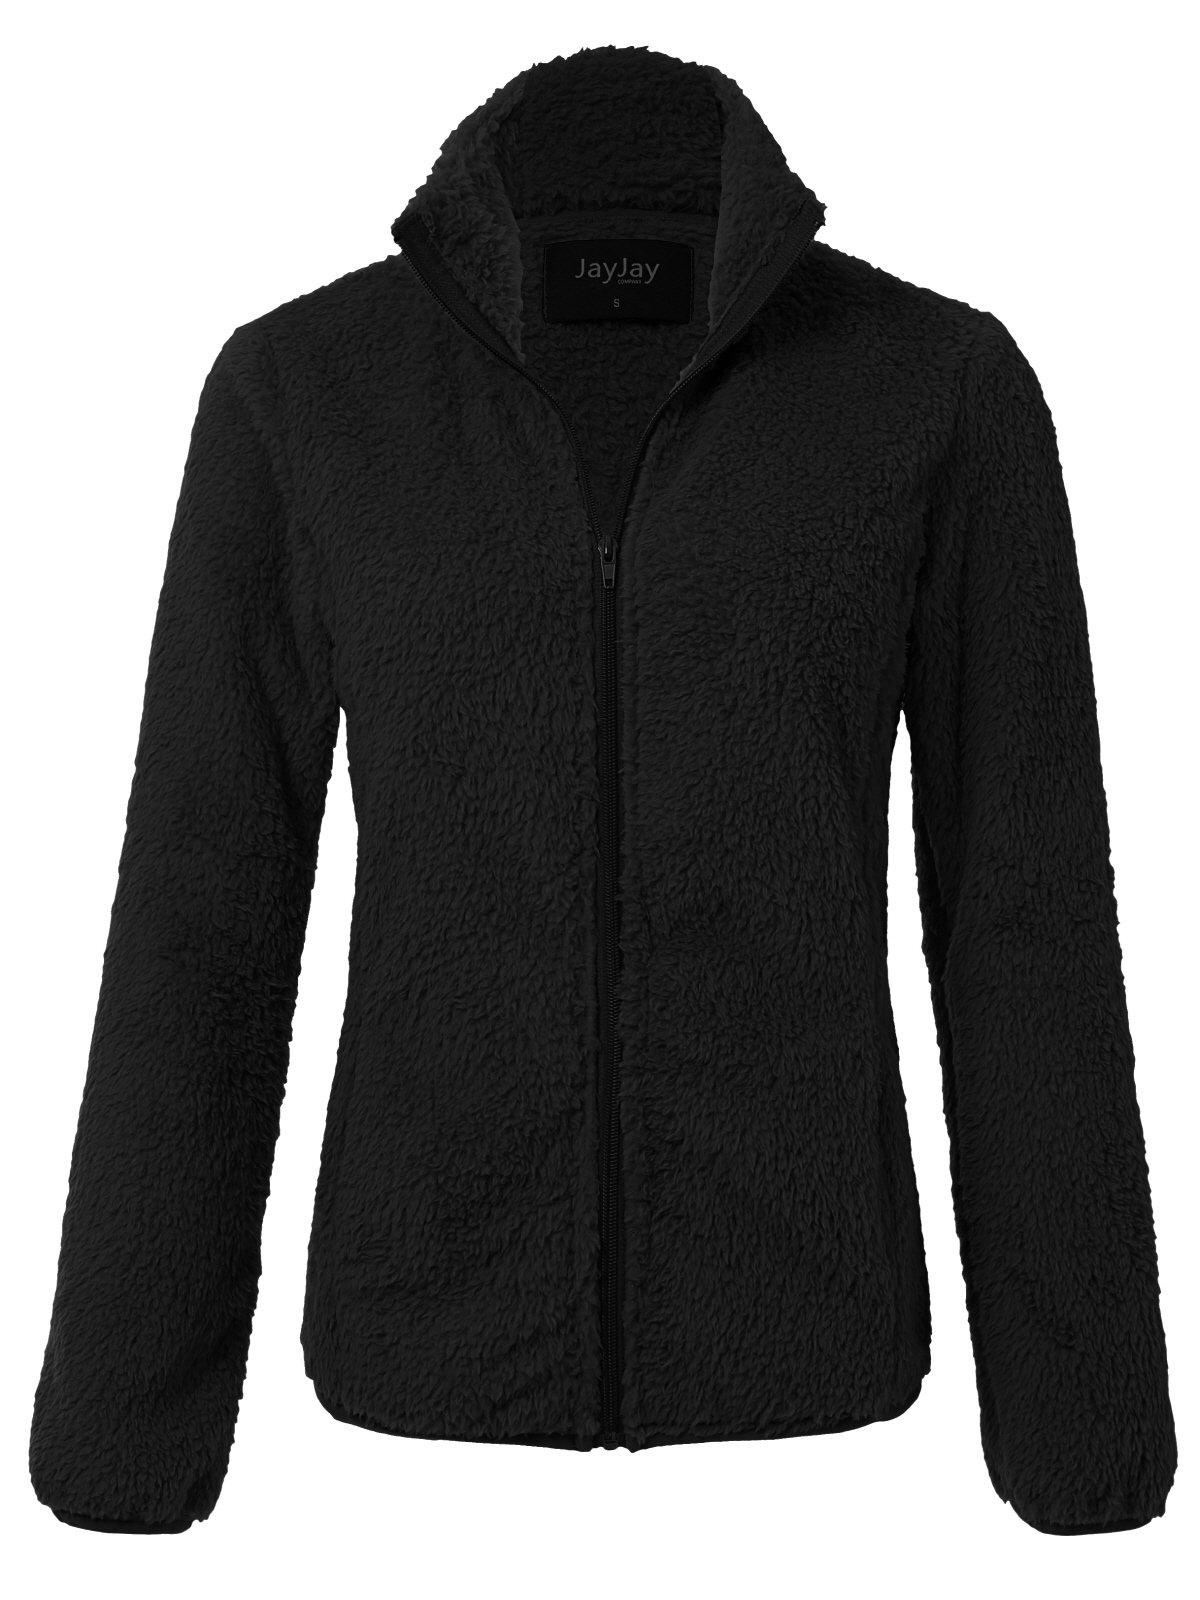 JayJay Women Athlete Ultra Soft Fur Fleece Long Sleeve Jersey Jacket,Black,2XL